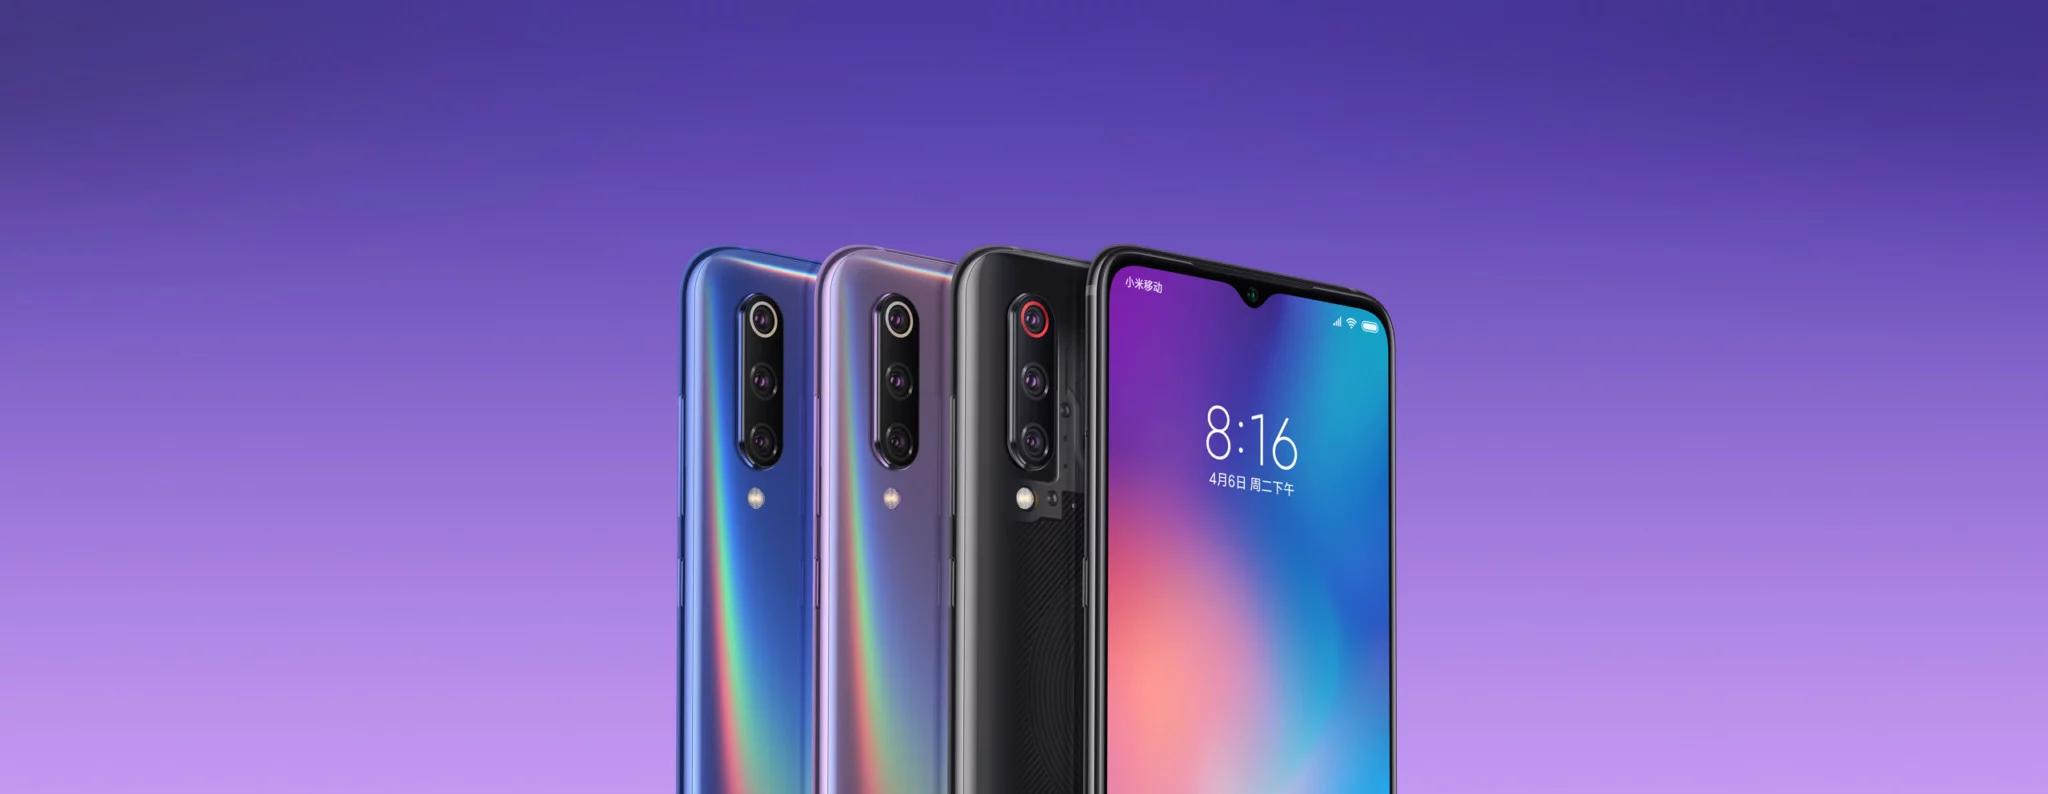 Xiaomi Mi 9 transparente